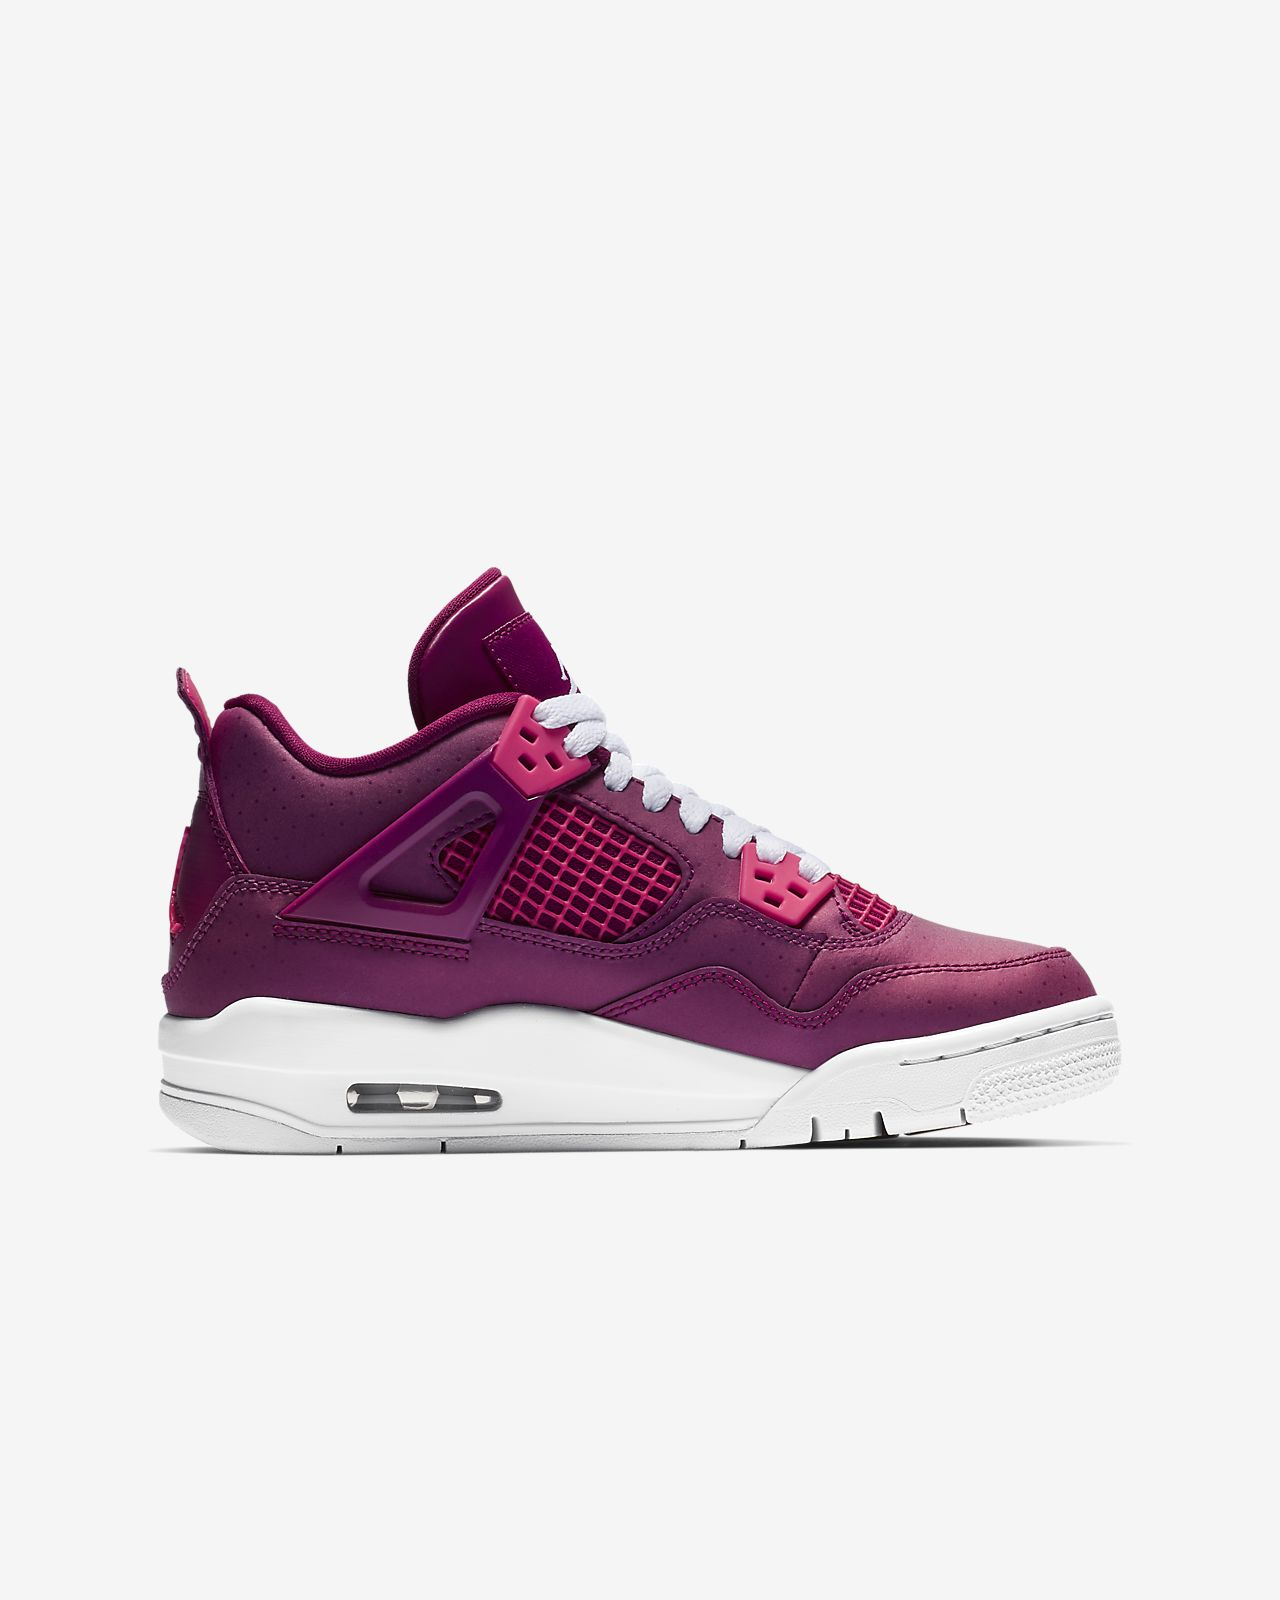 sale retailer 3105f 4e074 ... Air Jordan 4 Retro Big Kids  Shoe